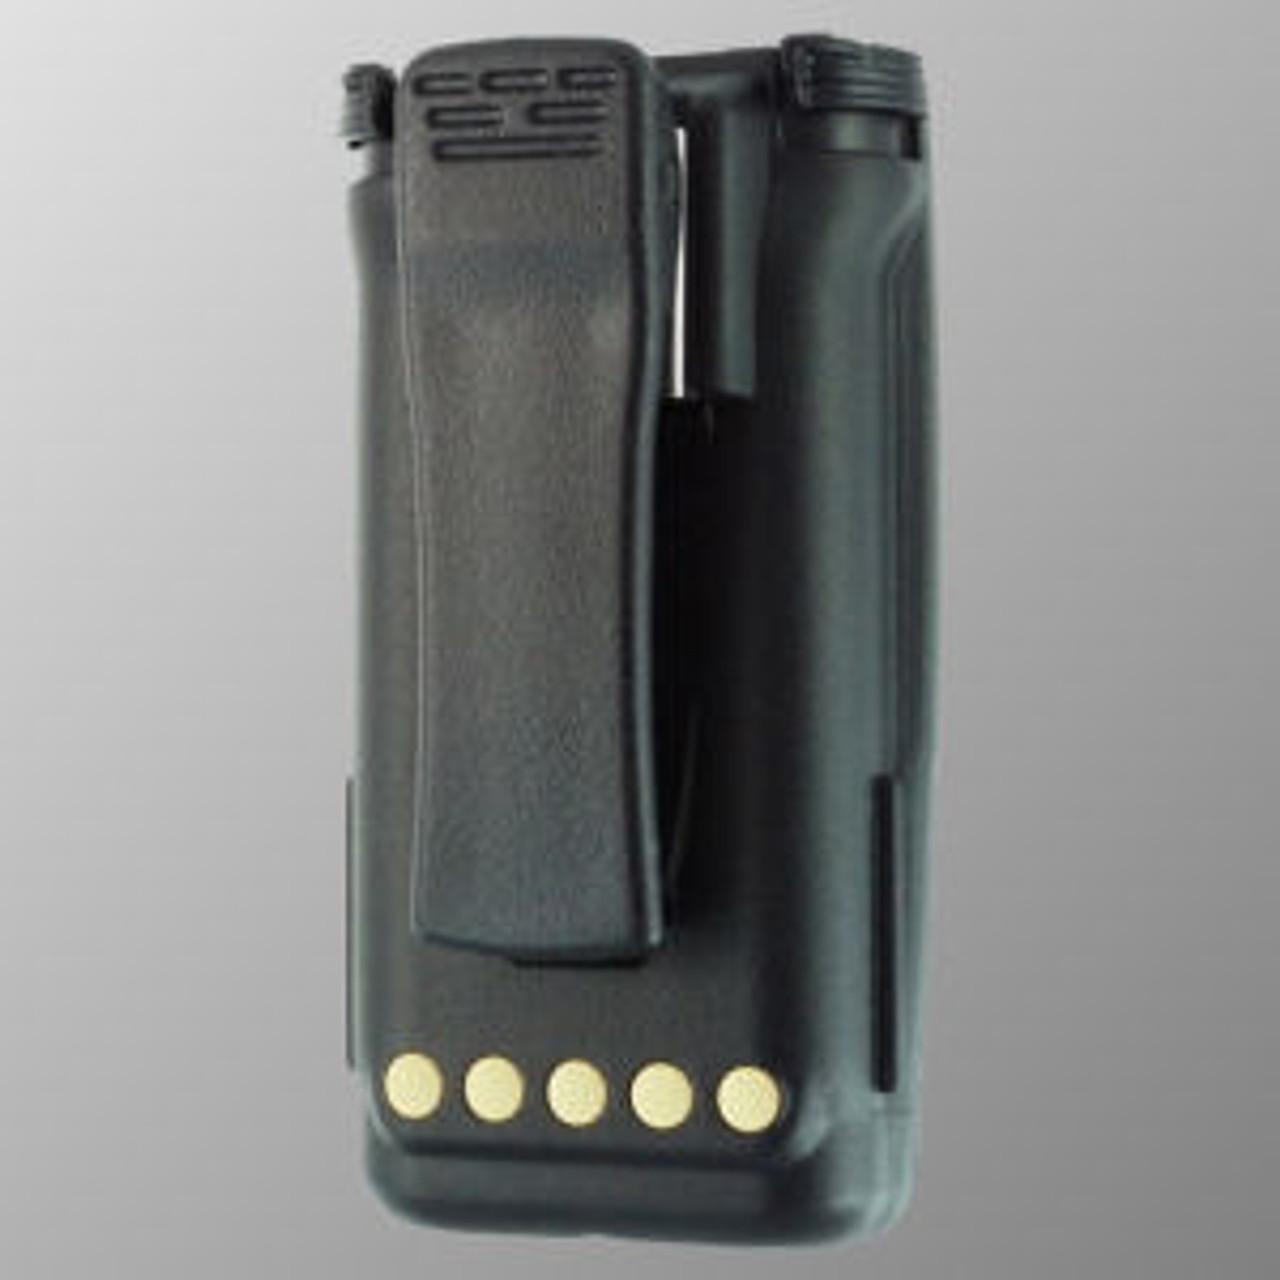 Harris P5350 Lithium Polymer Battery - 3600mAh